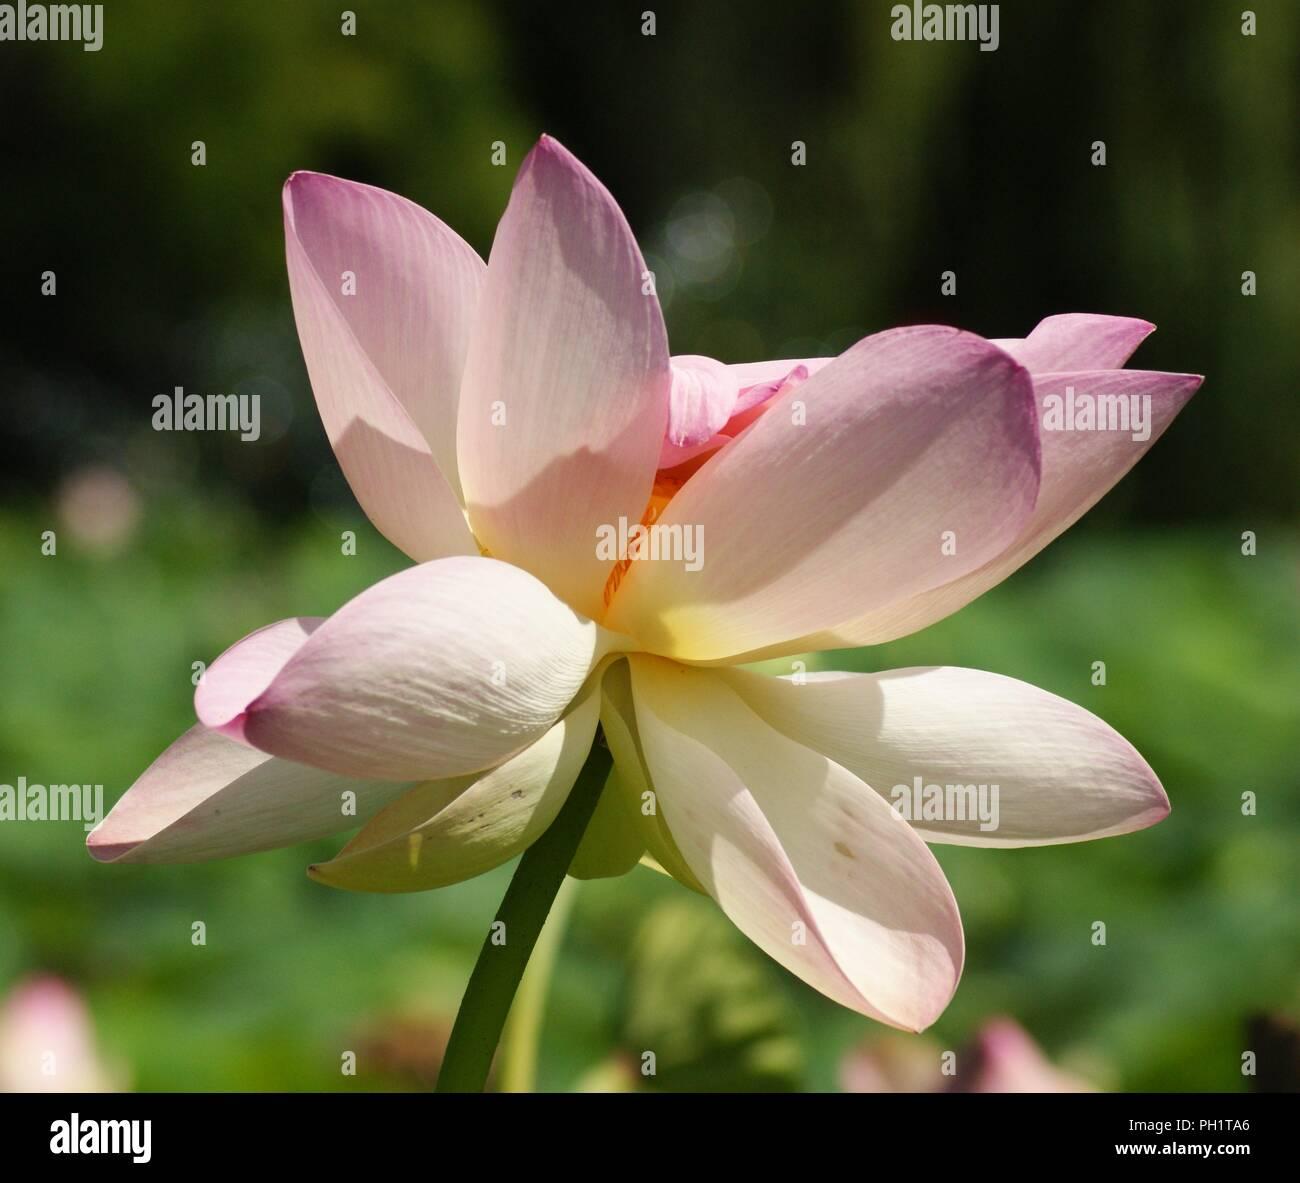 Fleur De Lotus fleur rose de lotus nelumbo, pink waterlillie nelumbo flower, rosa